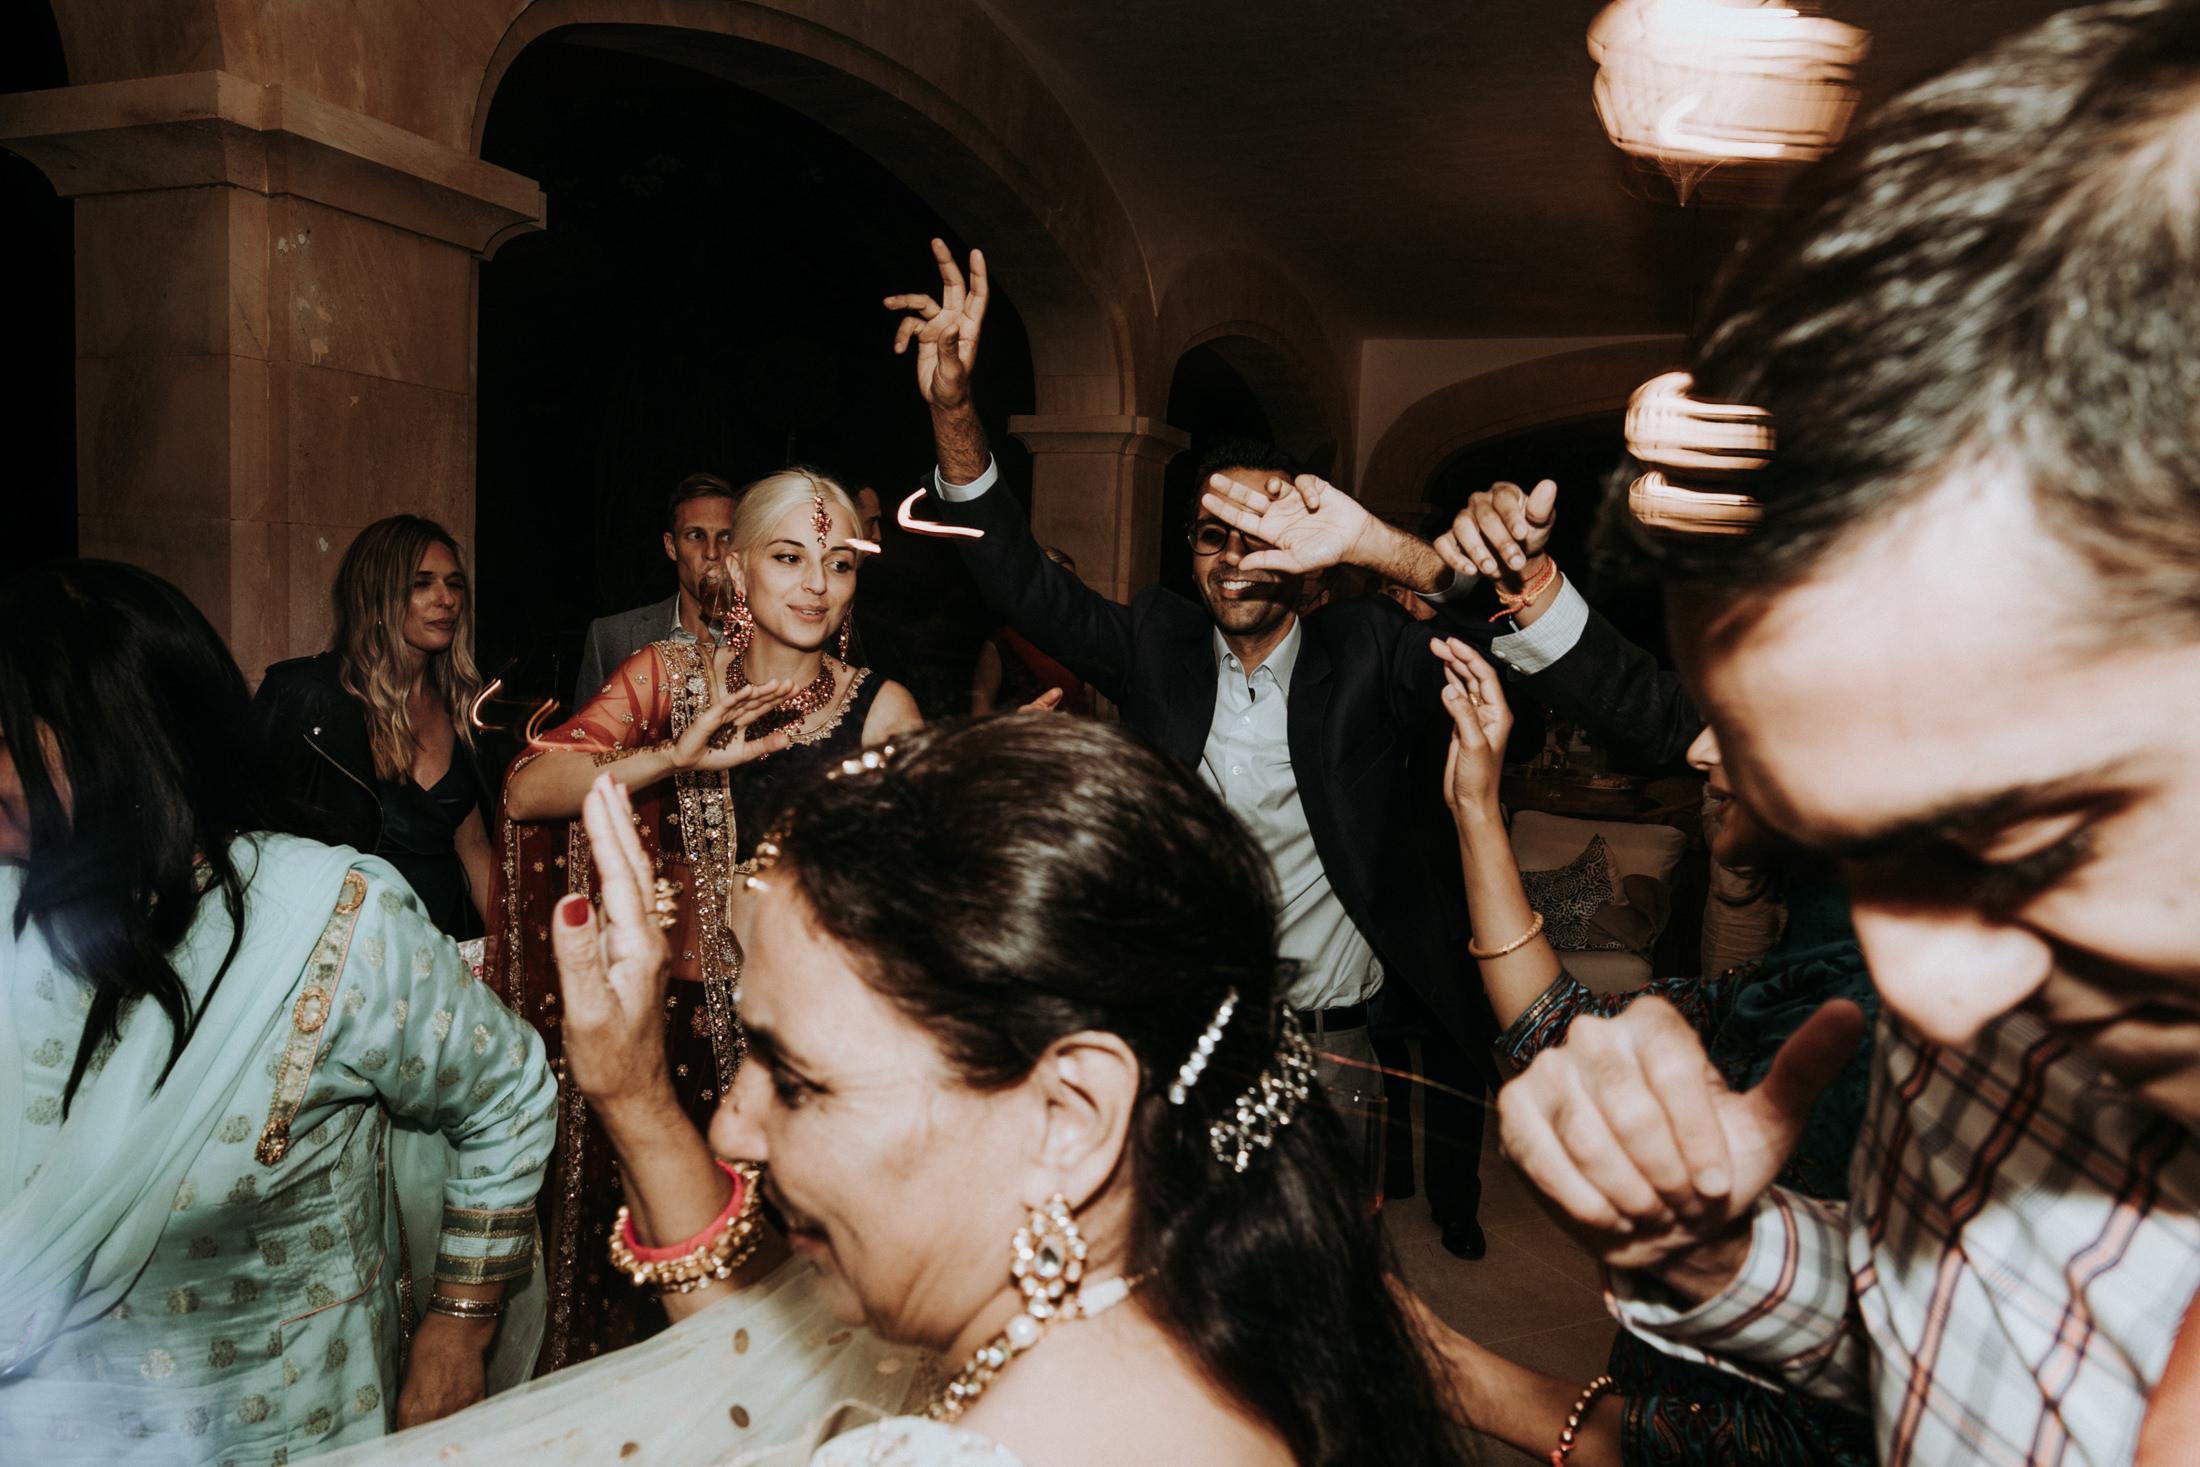 Wedding_Photographer_Mallorca_Daniela-Marquardt_Photography_New_York_Iceland_Tuscany_Santorini_Portugal_Austria_Bavaria_Elopement_Hochzeitsfotograf_AntjeRajat1_65